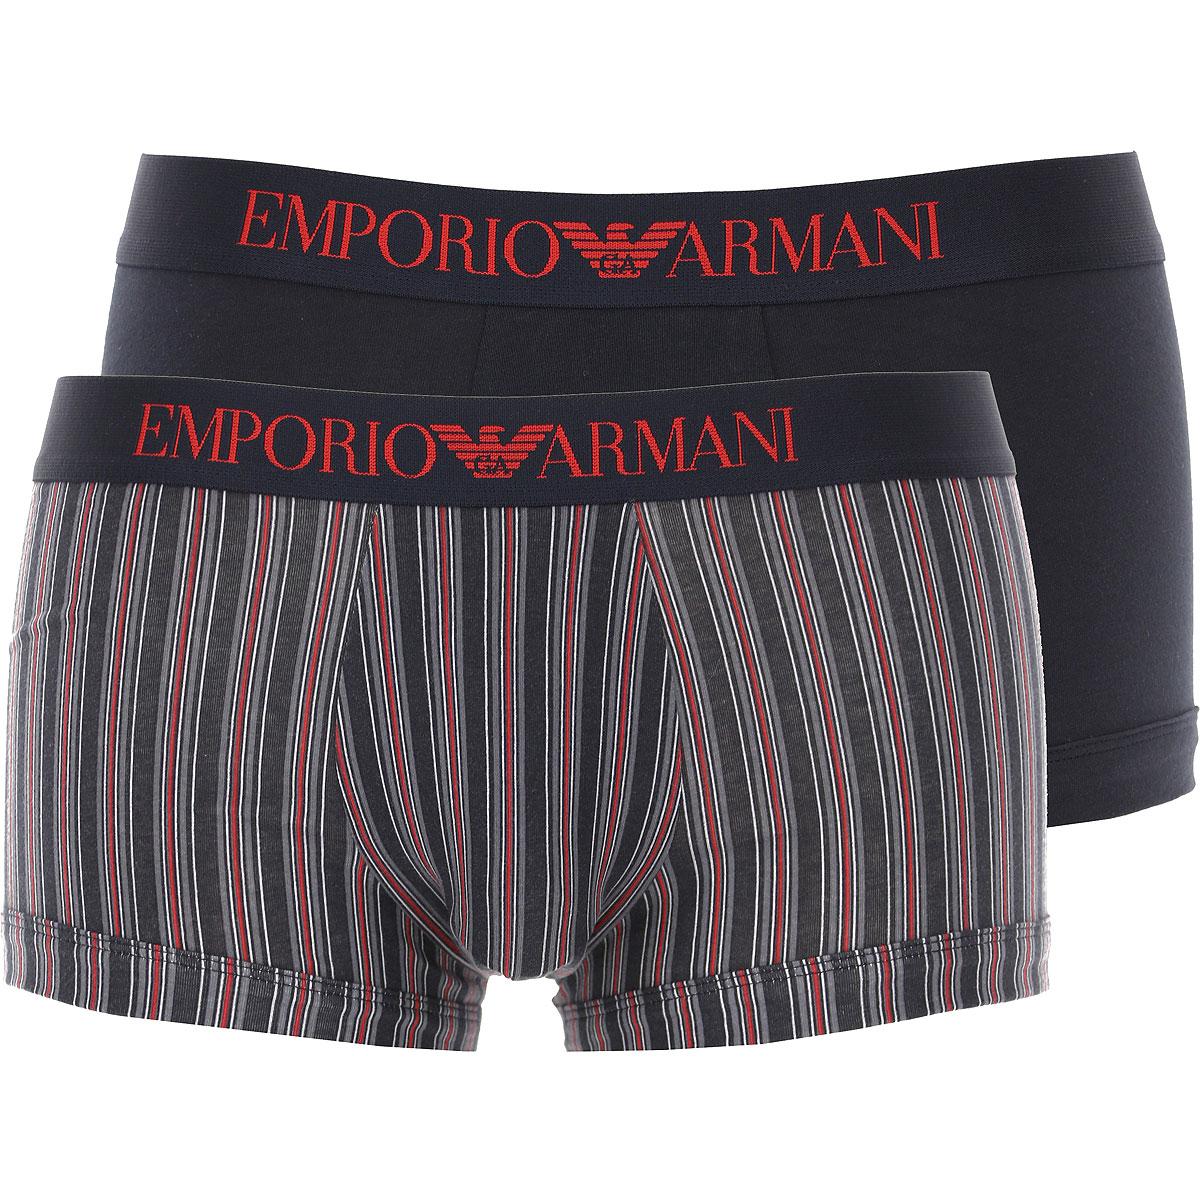 Emporio Armani Boxer Briefs for Men, Boxers On Sale, 2 Pack, Anthracite Grey, Cotton, 2019, M (EU 4) L (EU 5)